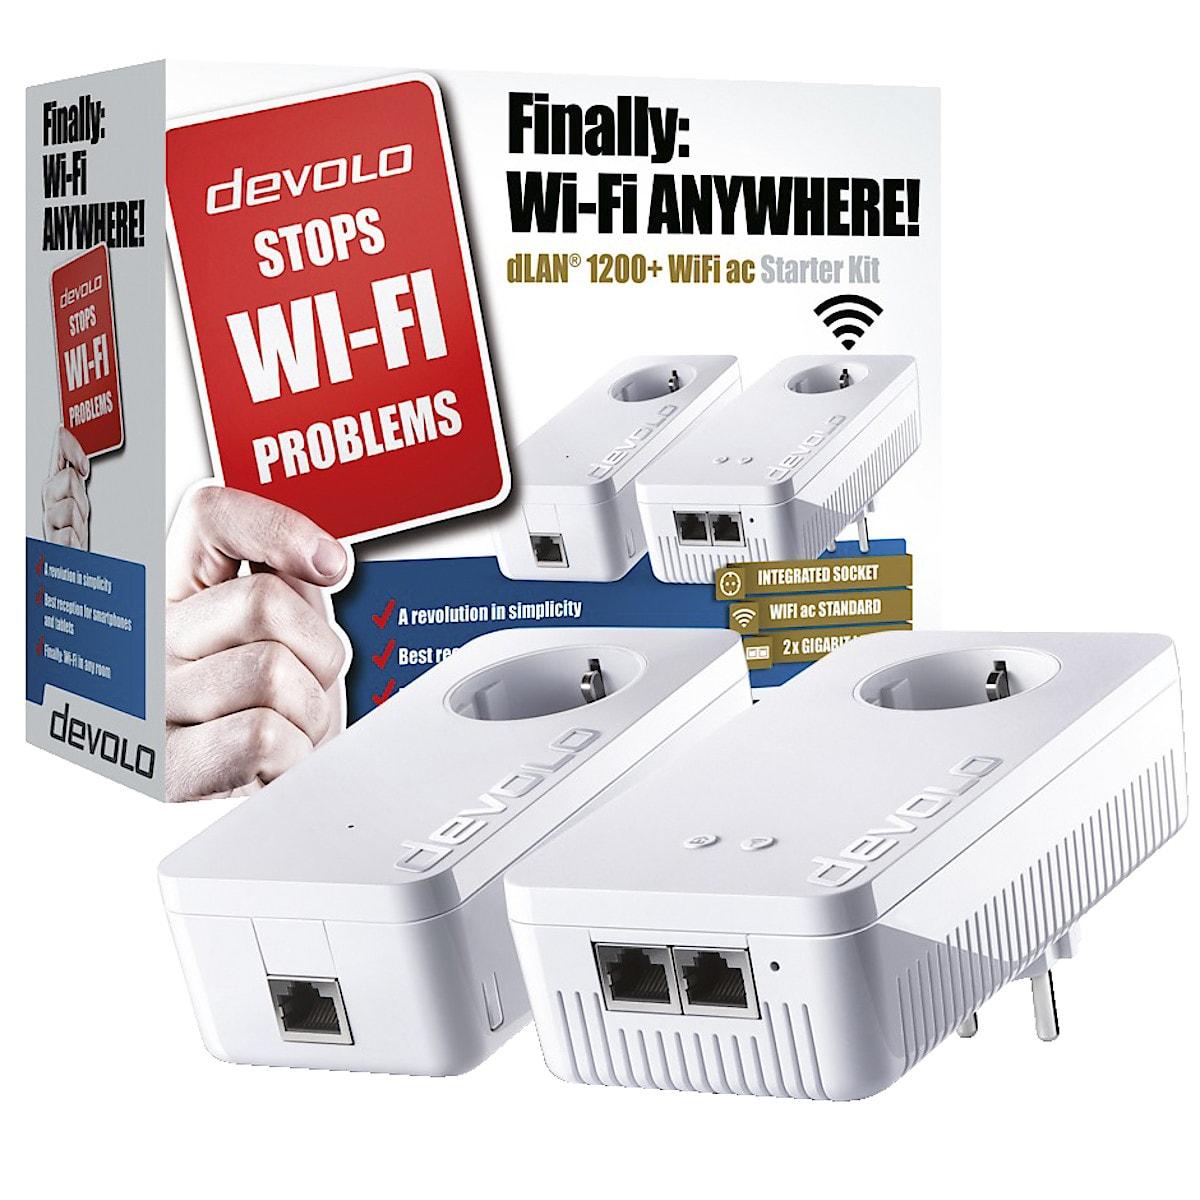 HomePlug Devolo dLAN 1200 + WiFi AC -aloitussarja